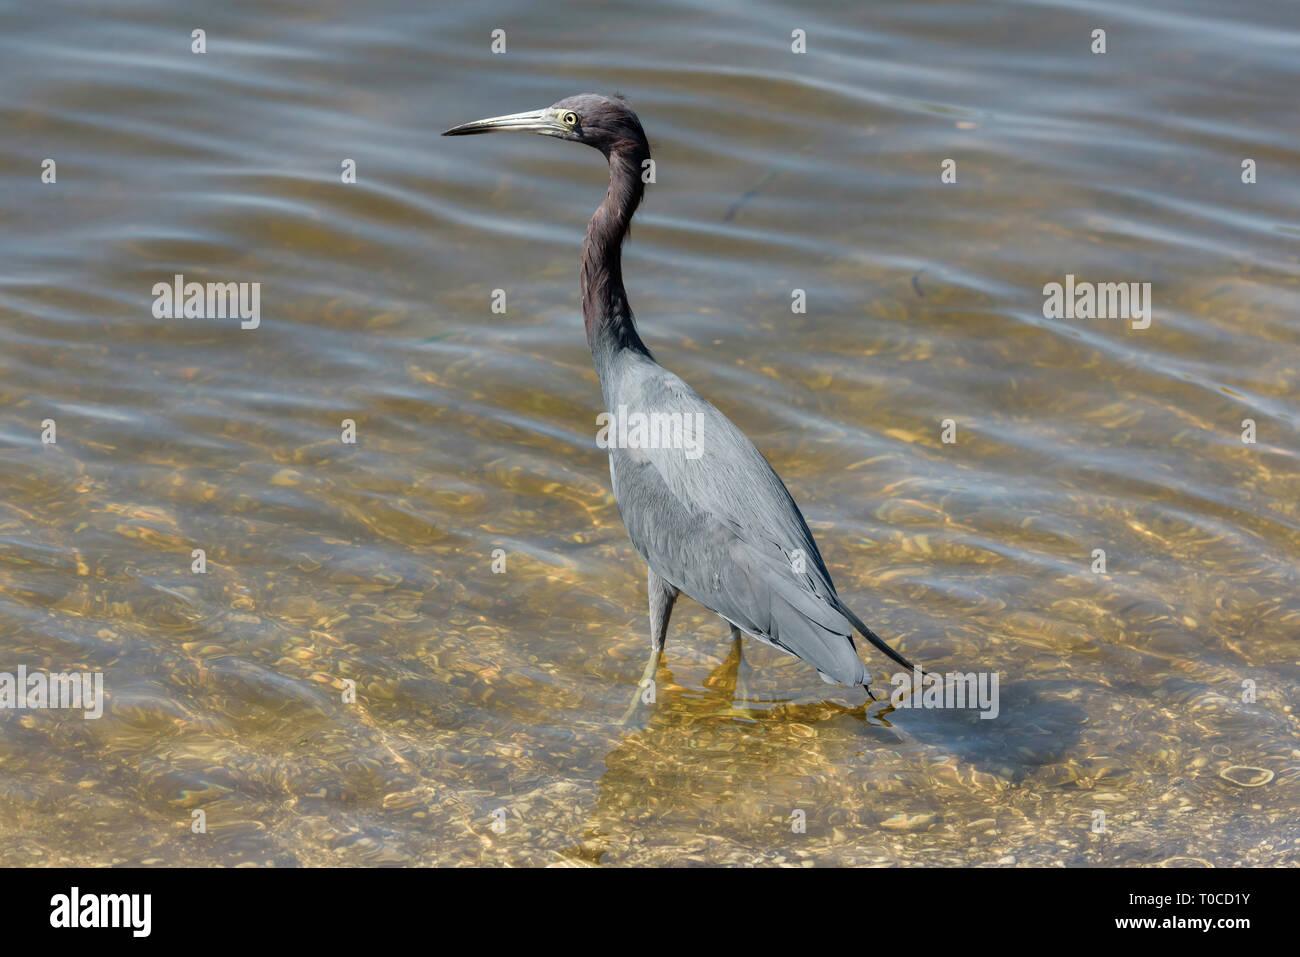 Little blue heron (Egretta caerulea) in J.N. Ding Darling National Wildlife Refuge, Sanibel Island, Florida, USA - Stock Image